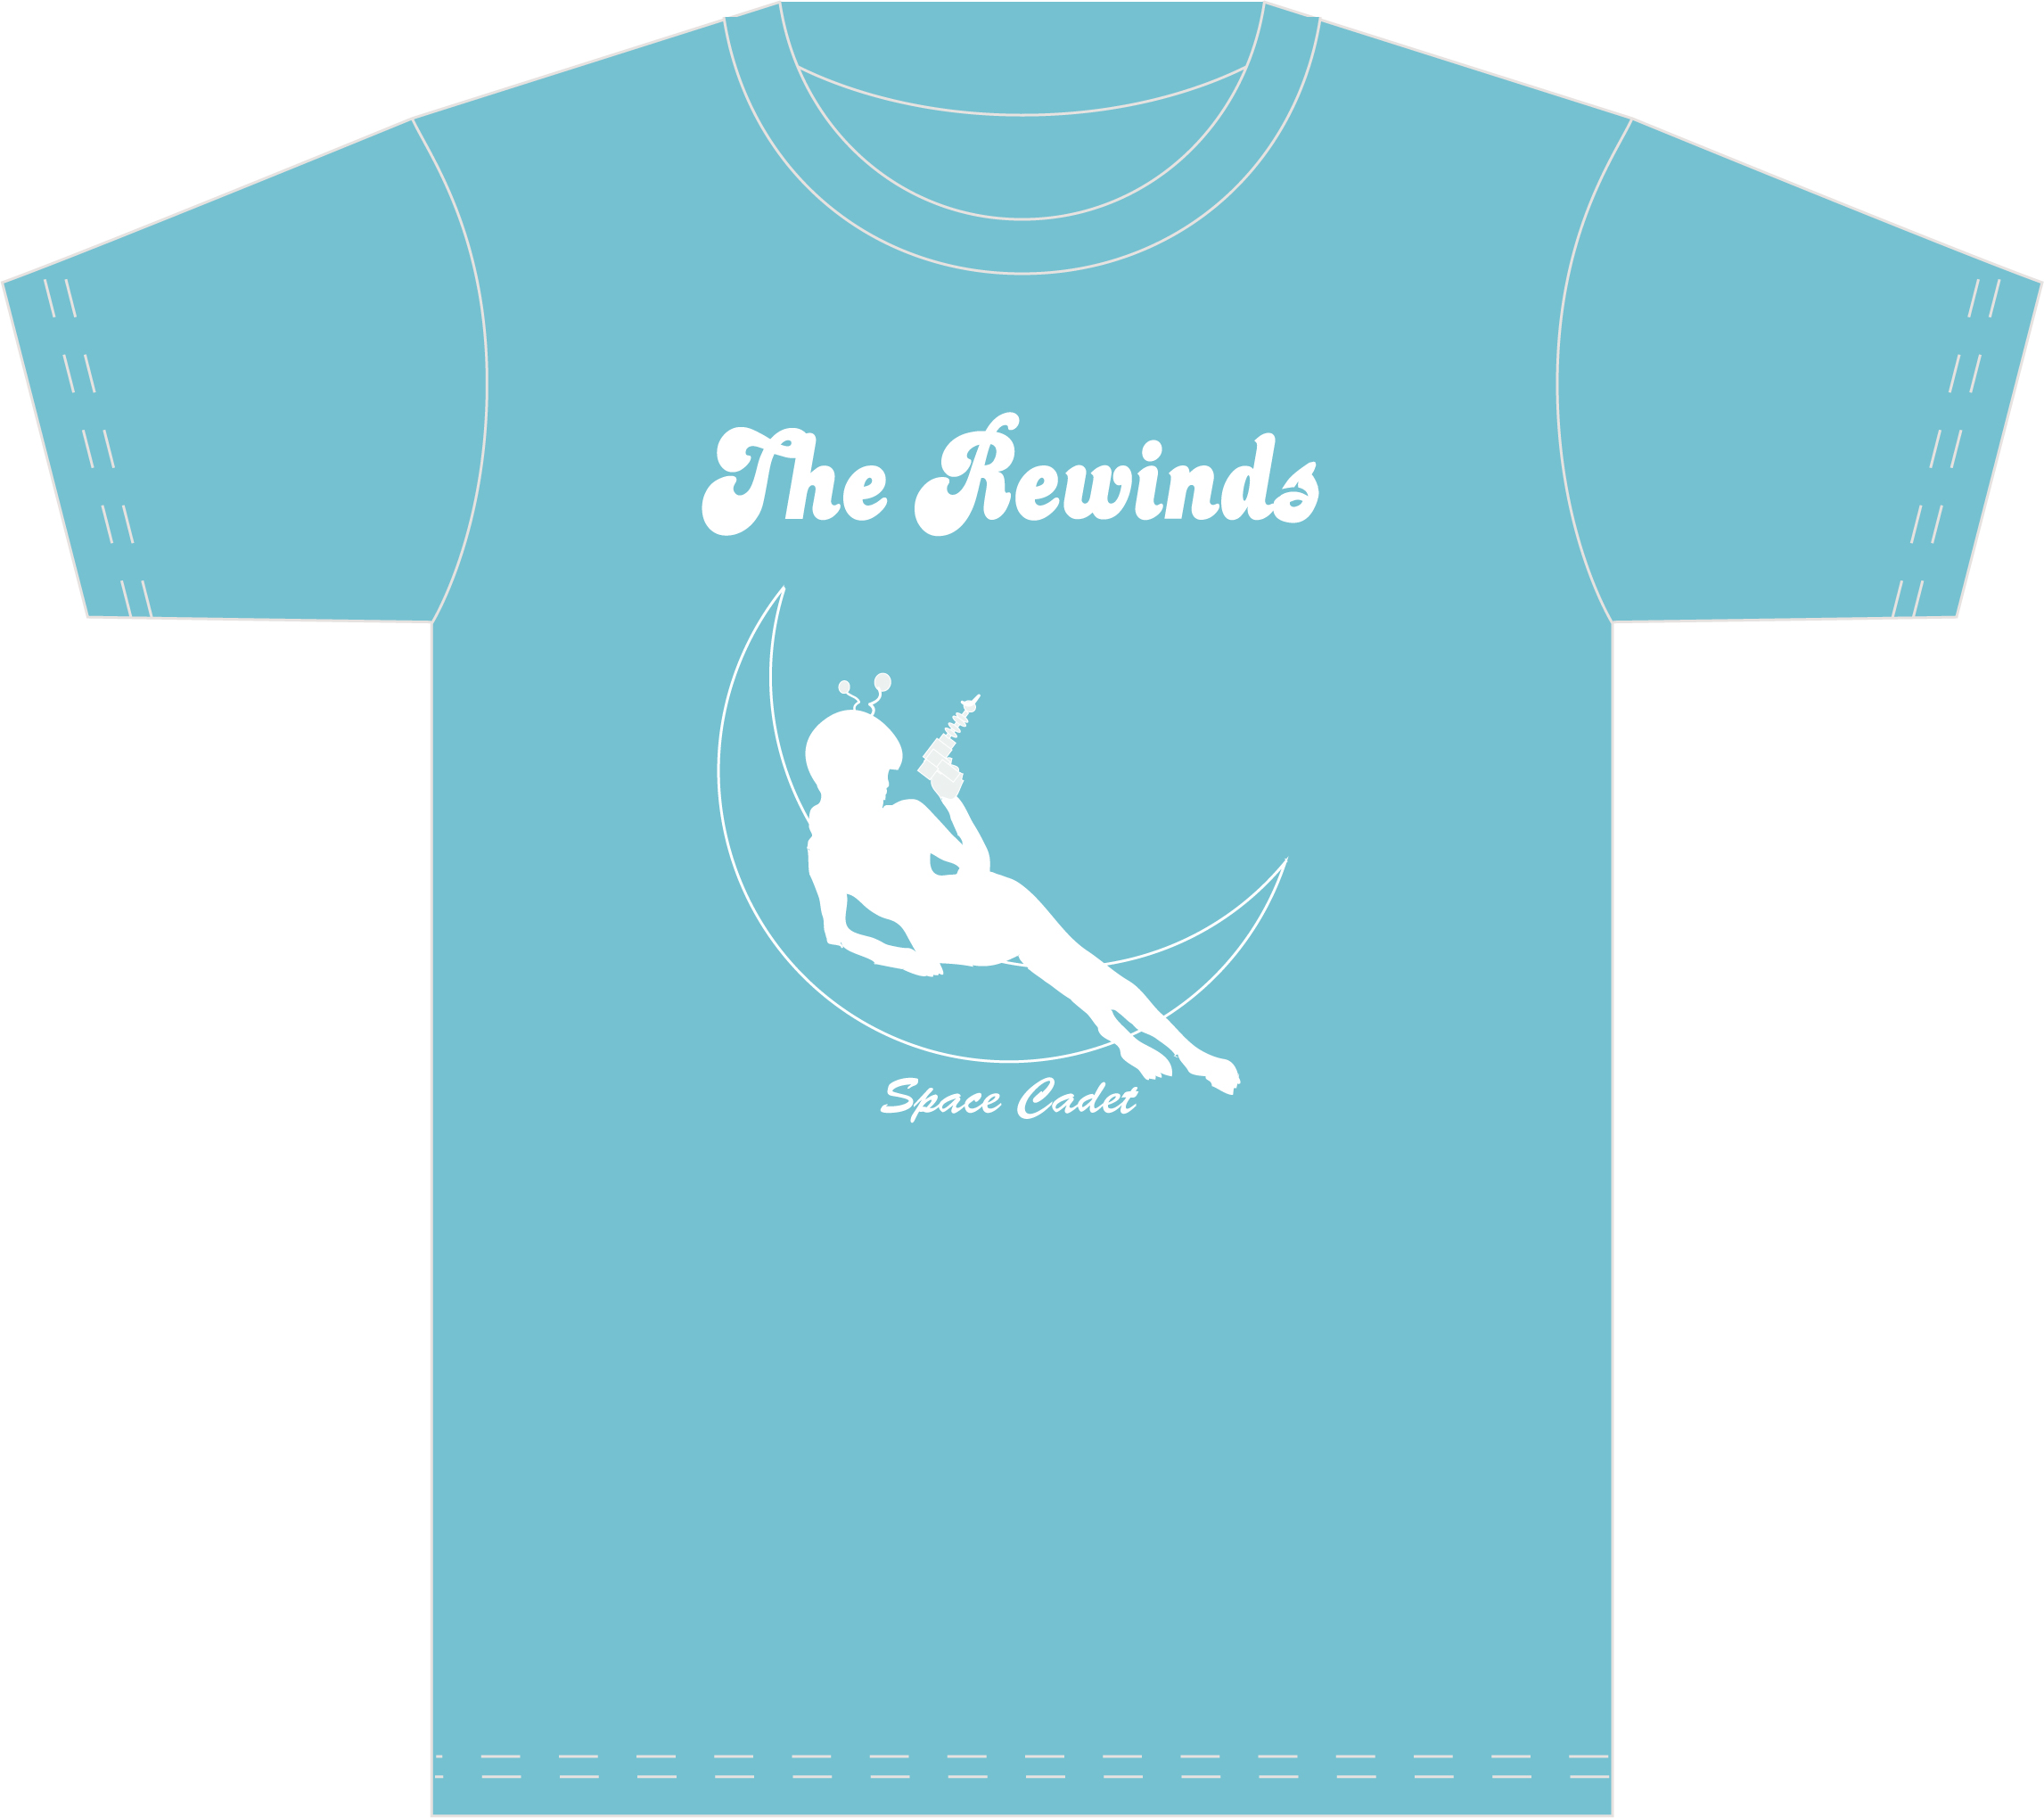 T shirt design huntsville al - Rewinds Space Cadet T Shirt Design Not Much To Say On This One Pretty Straightforward Job